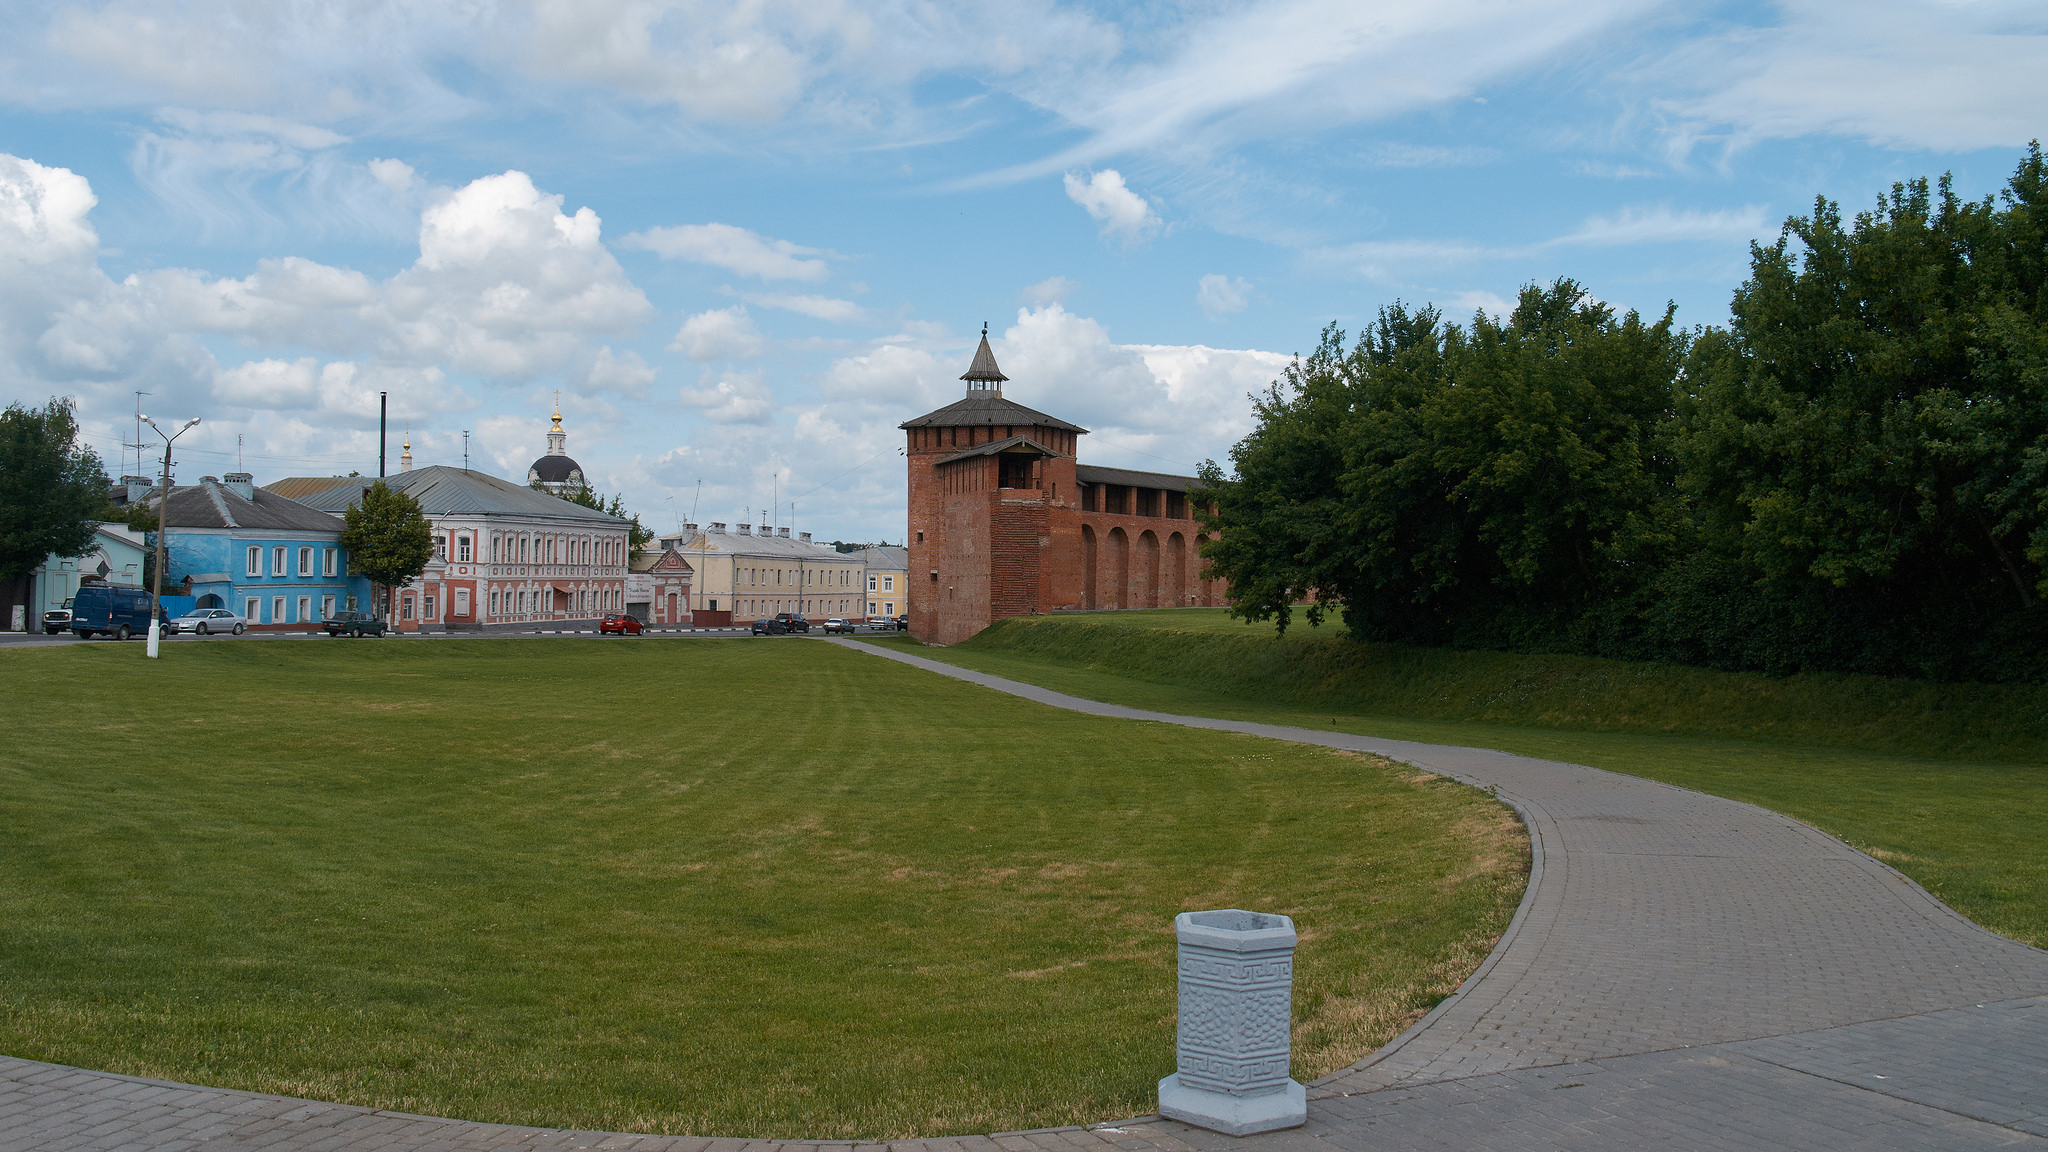 Территория перед Коломенским Кремлем, Коломна